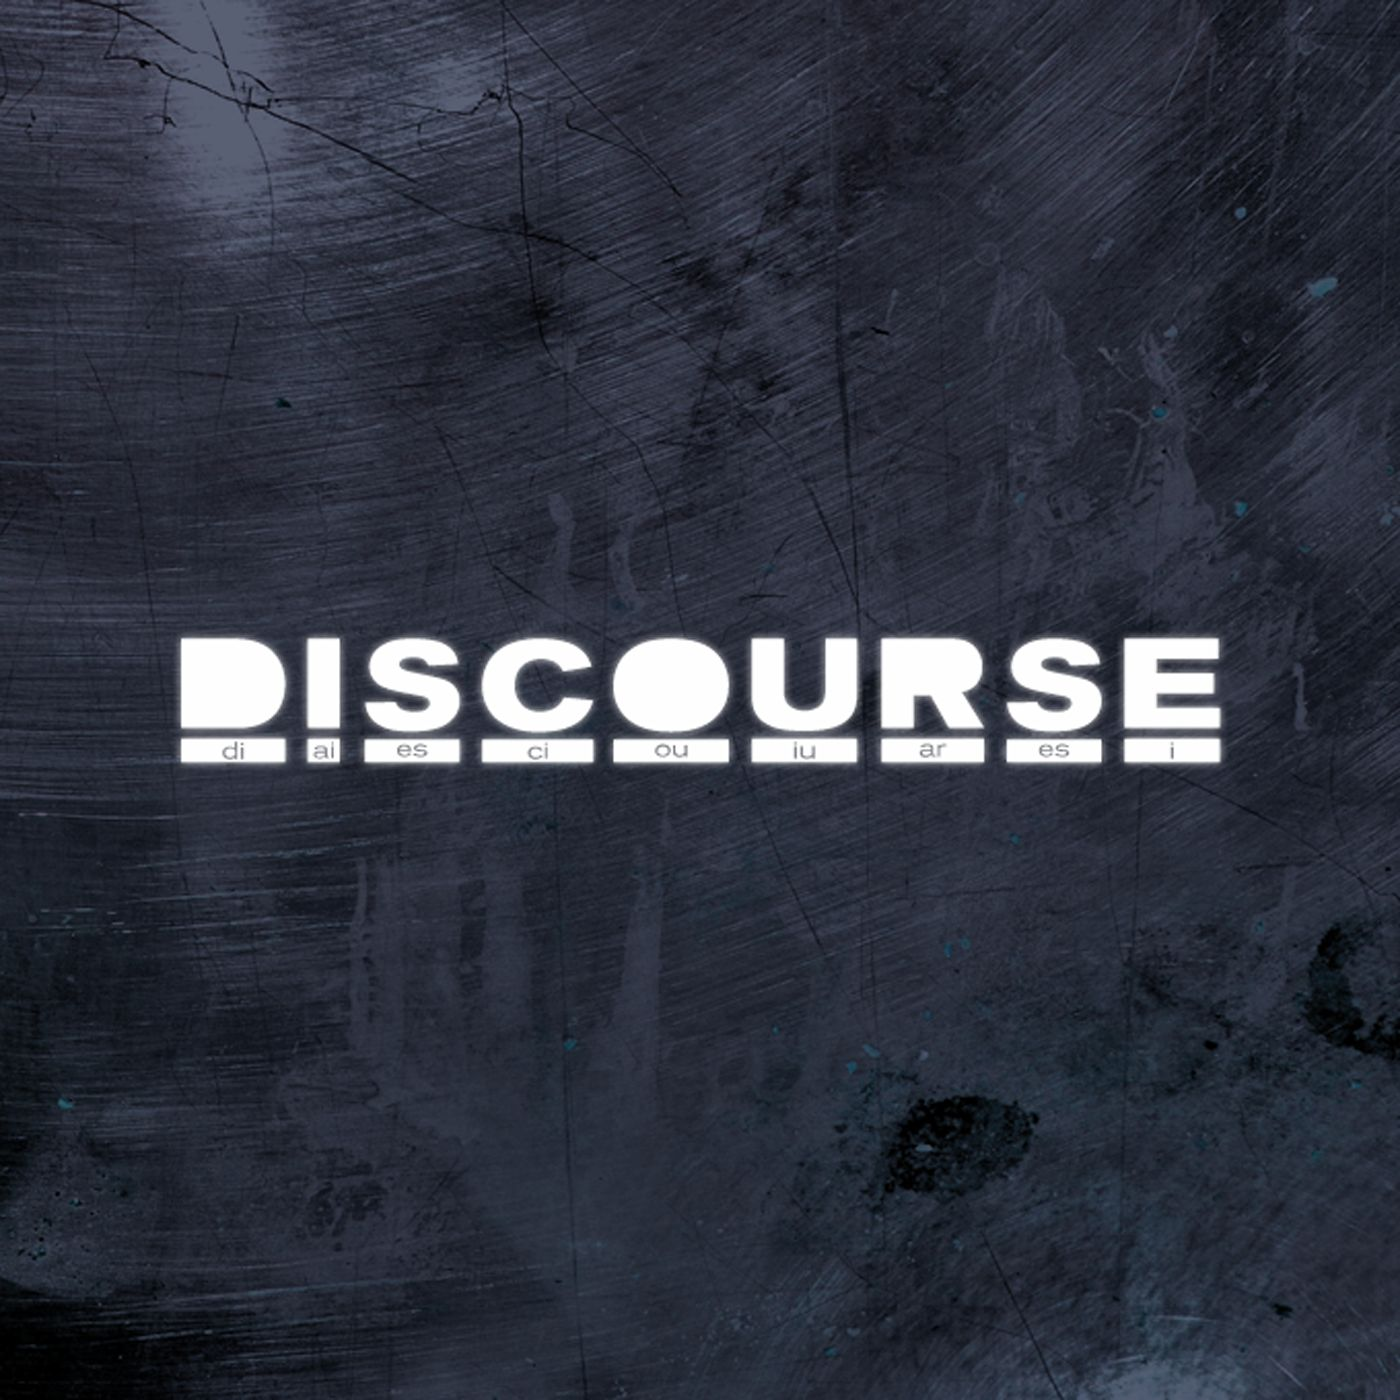 Discourse London